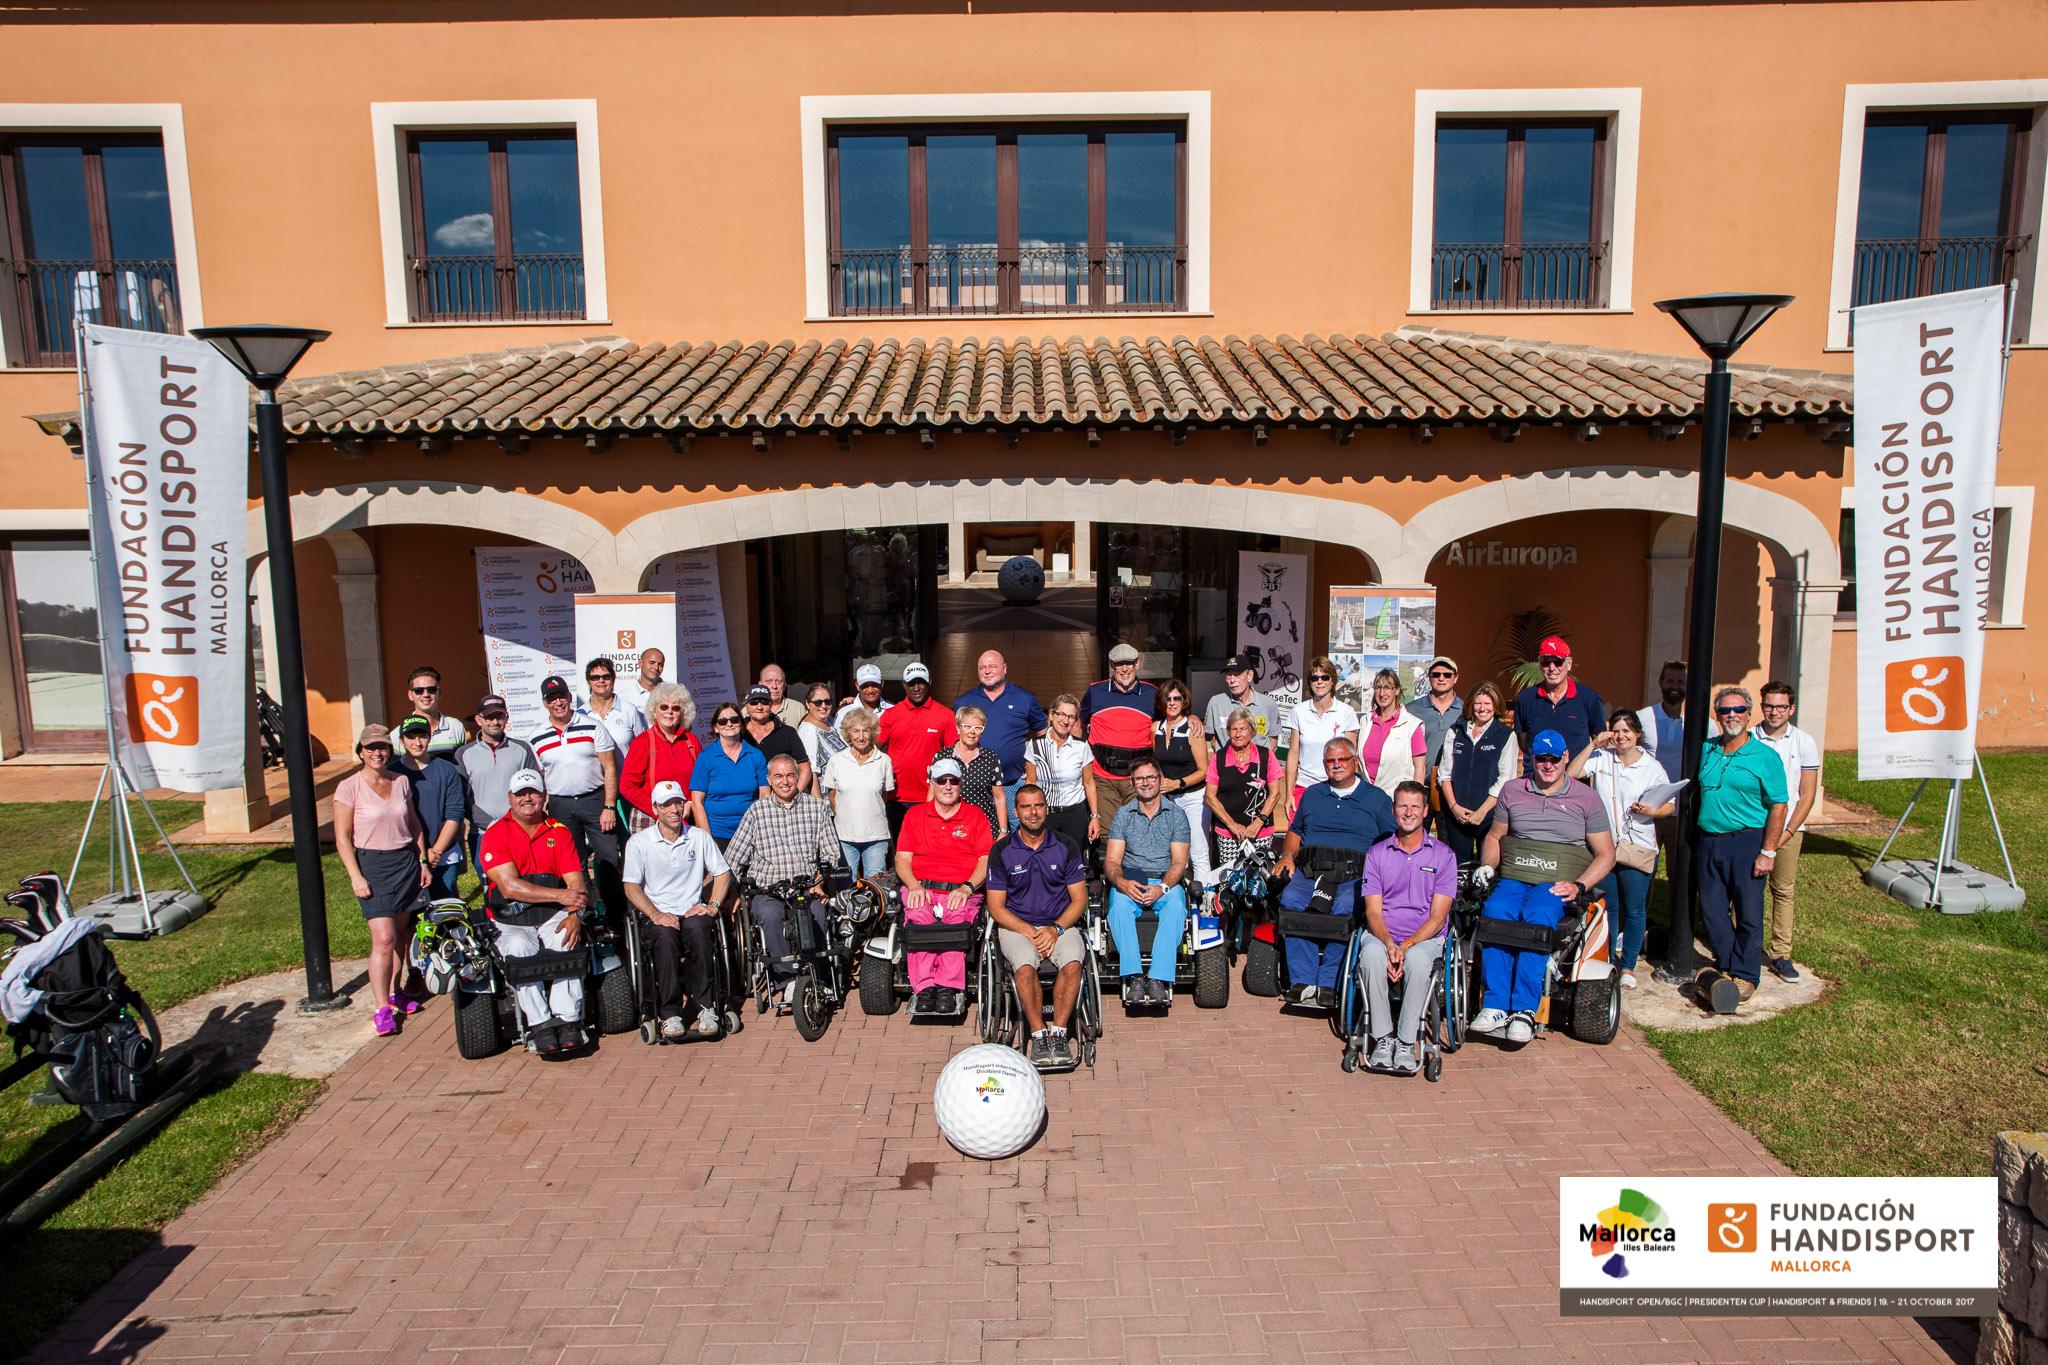 PBT supports BGC / Handisport Mallorca Open